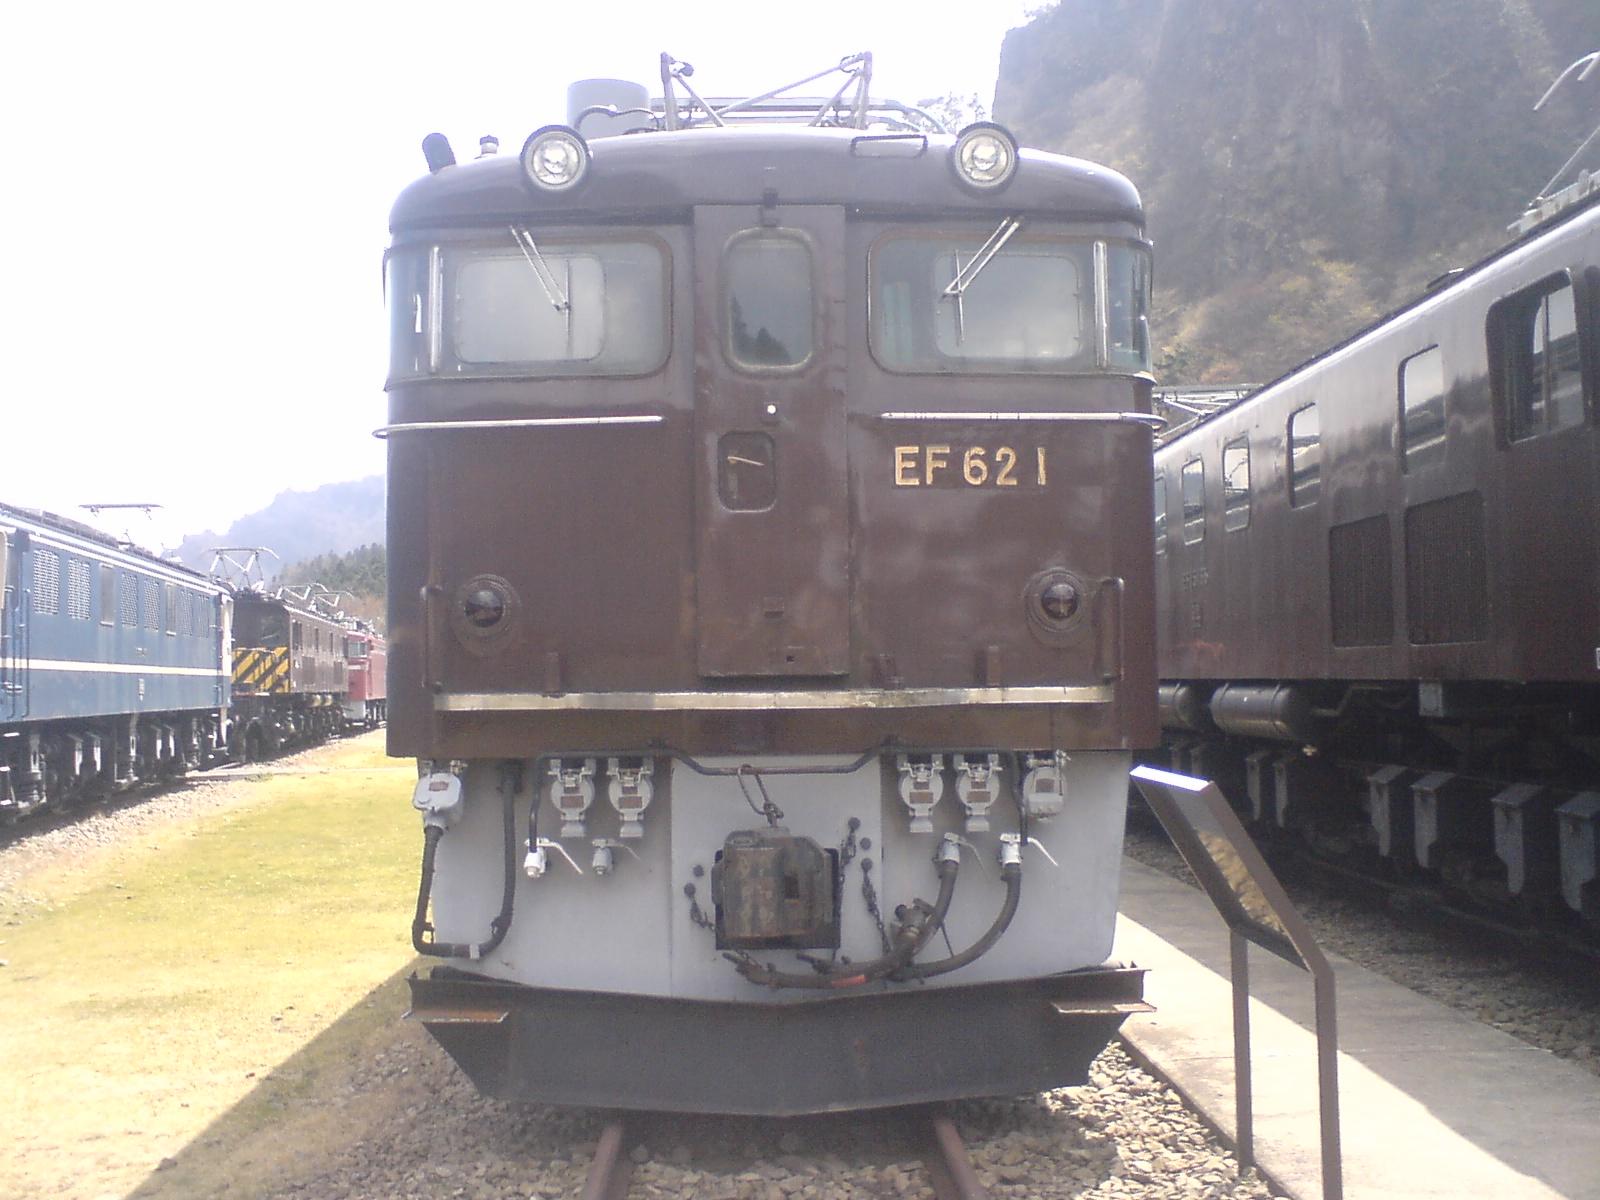 Kc380069